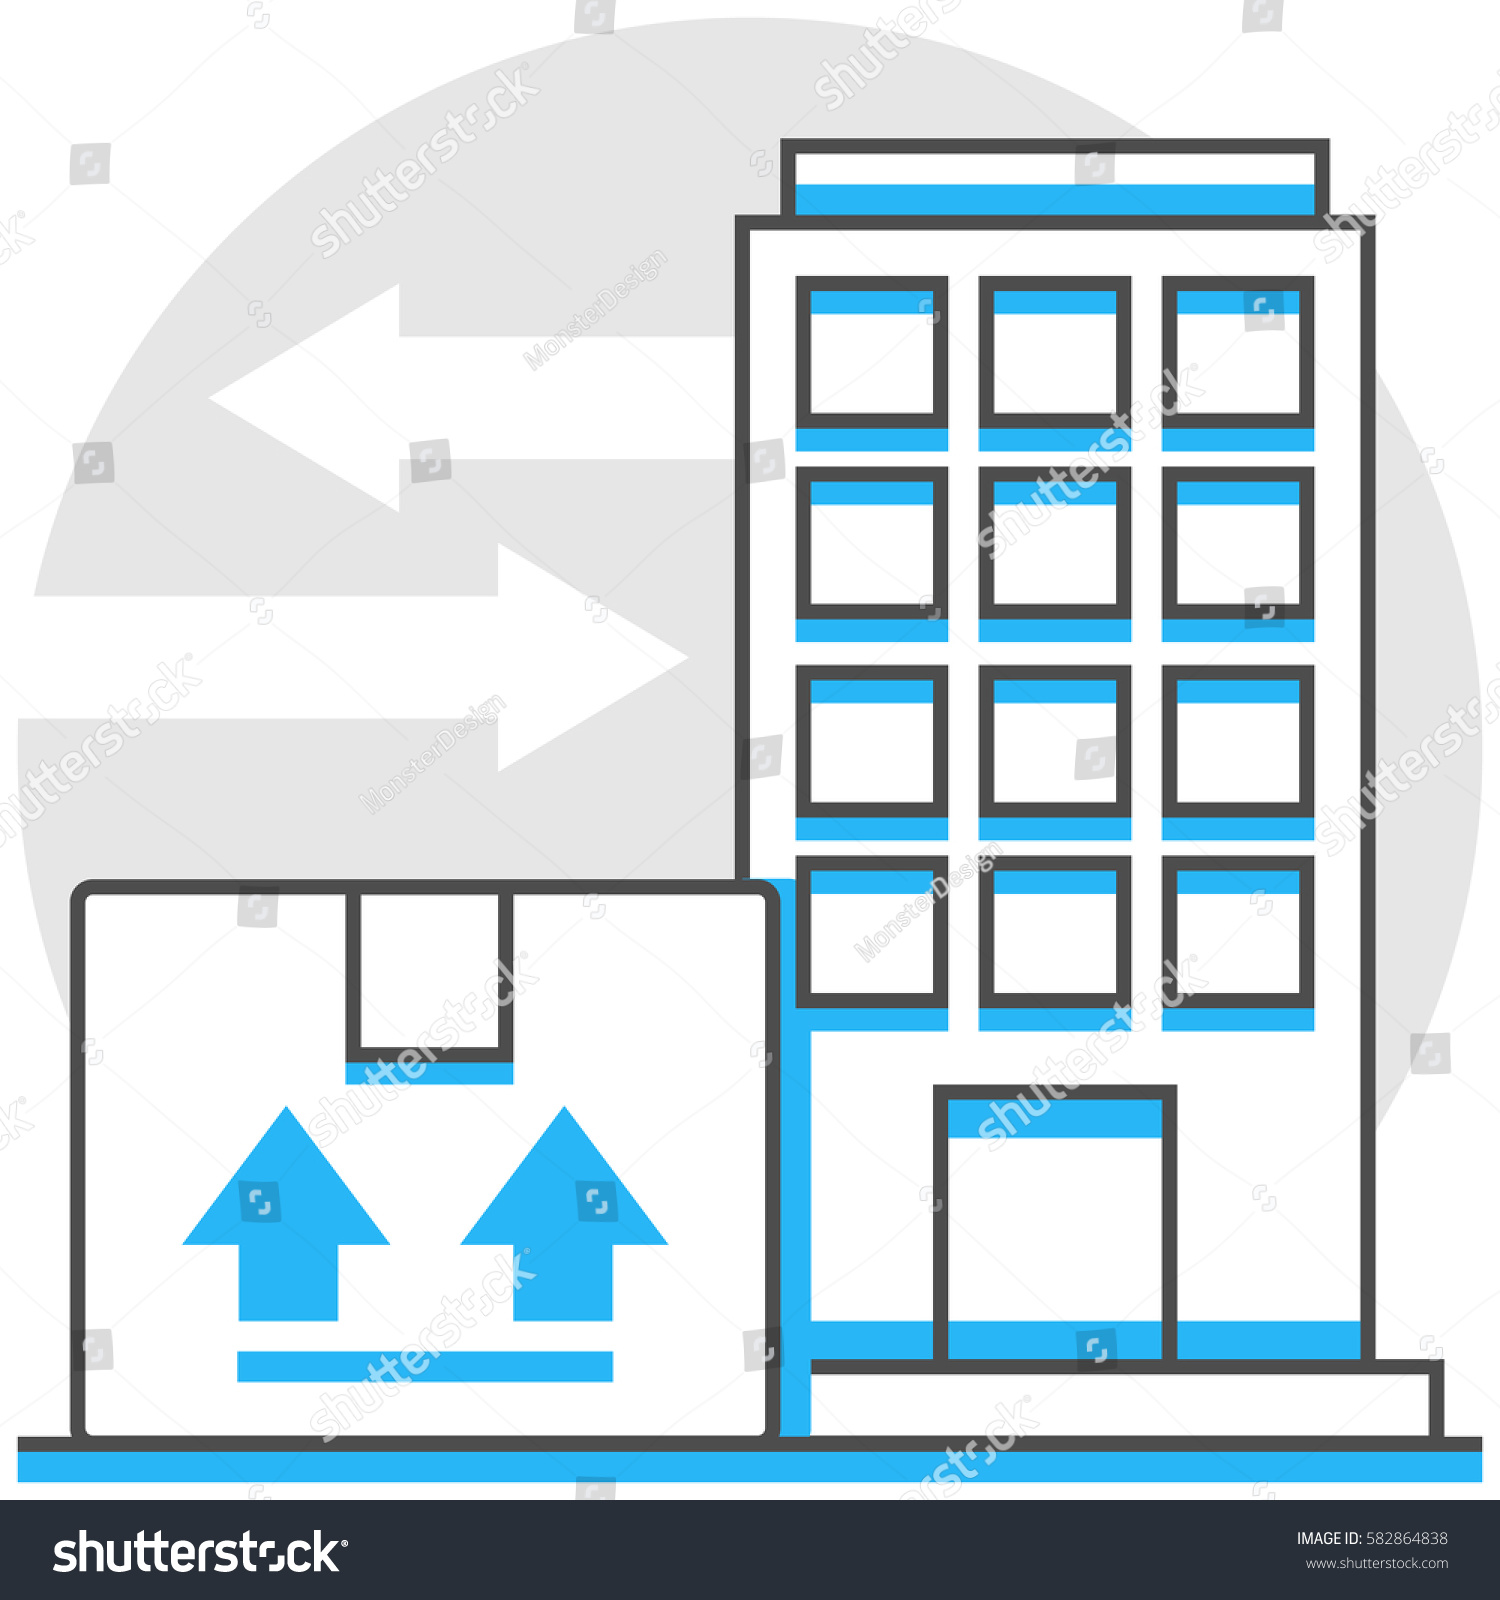 Export Trading Companies Infographic Icon Elements Stock